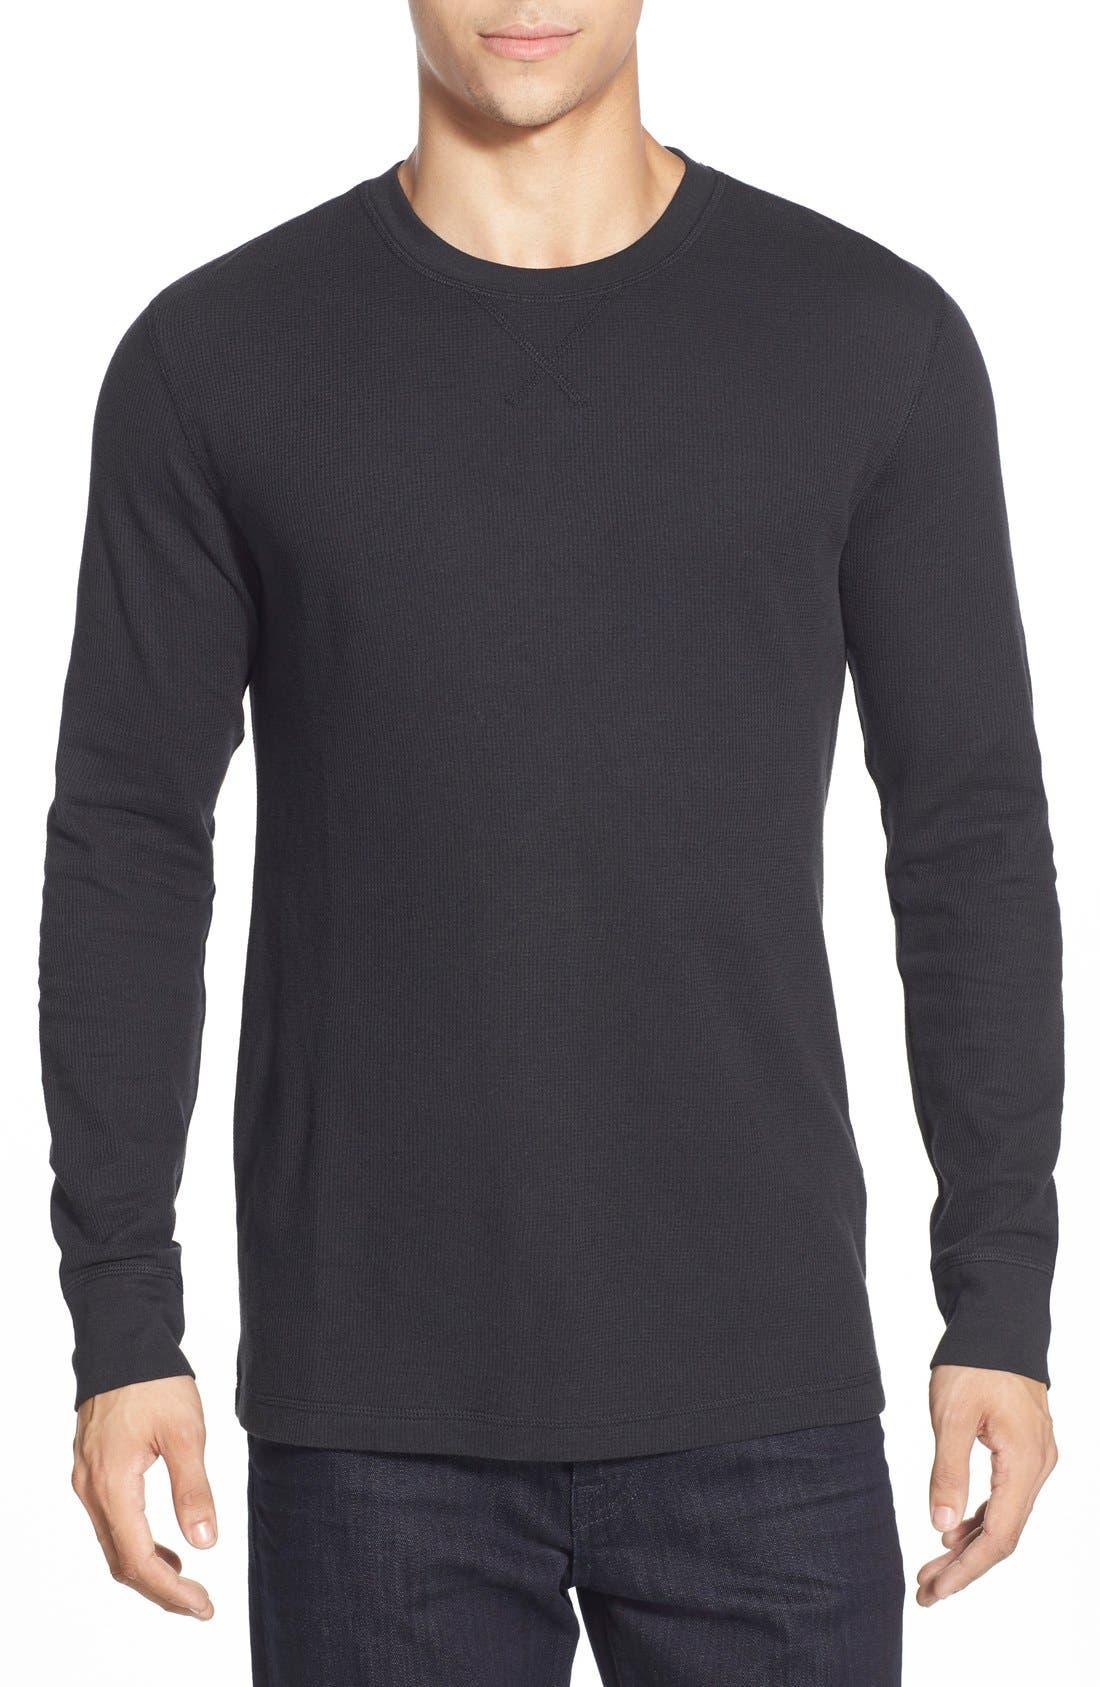 Alternate Image 1 Selected - Nordstrom Men's Shop Waffle Knit Long Sleeve T-Shirt